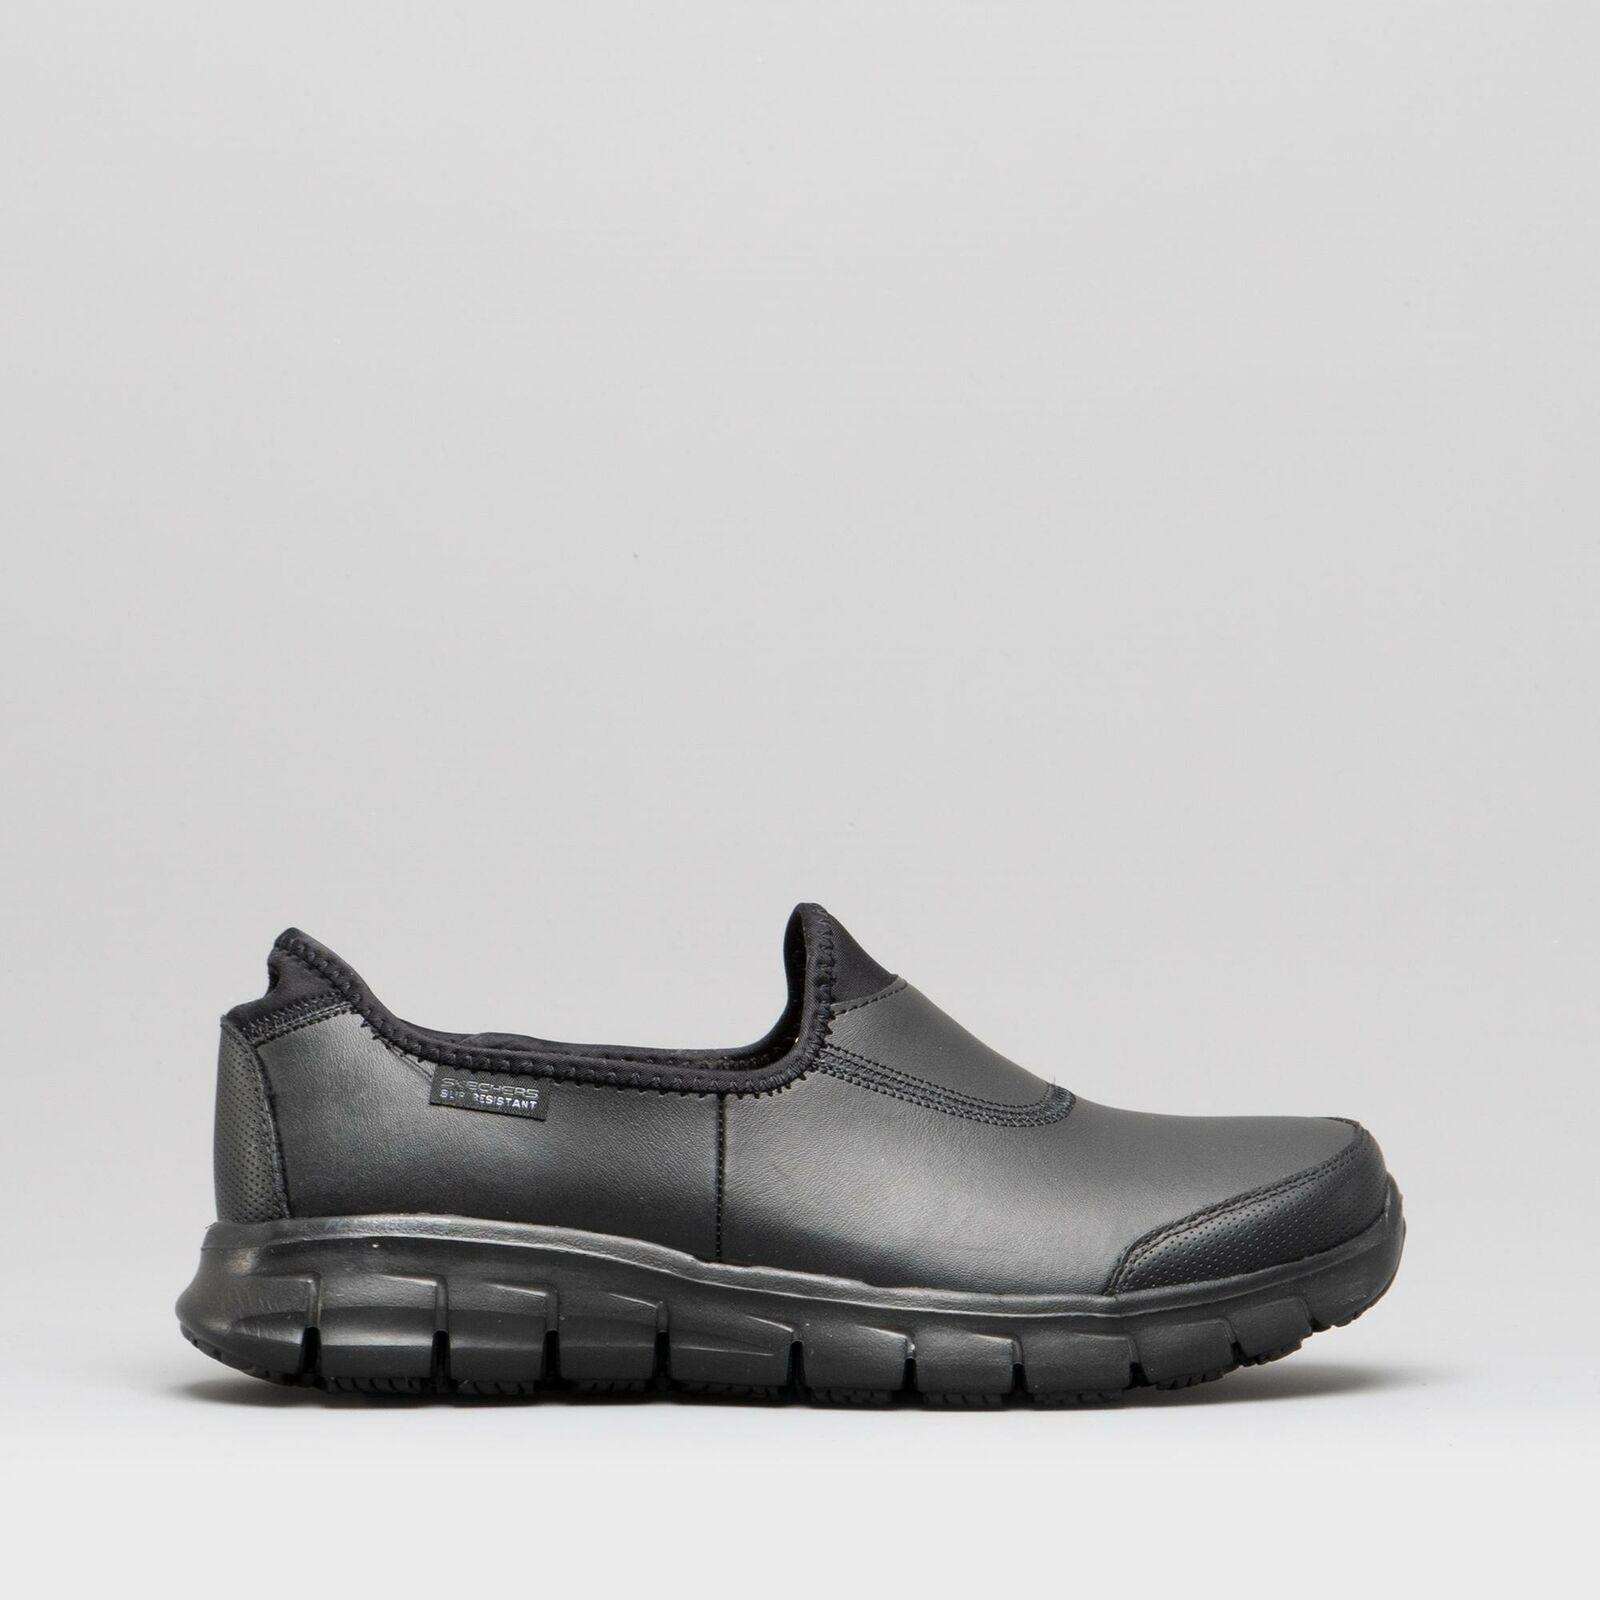 Skechers Women Sure Track Work Shoes 6